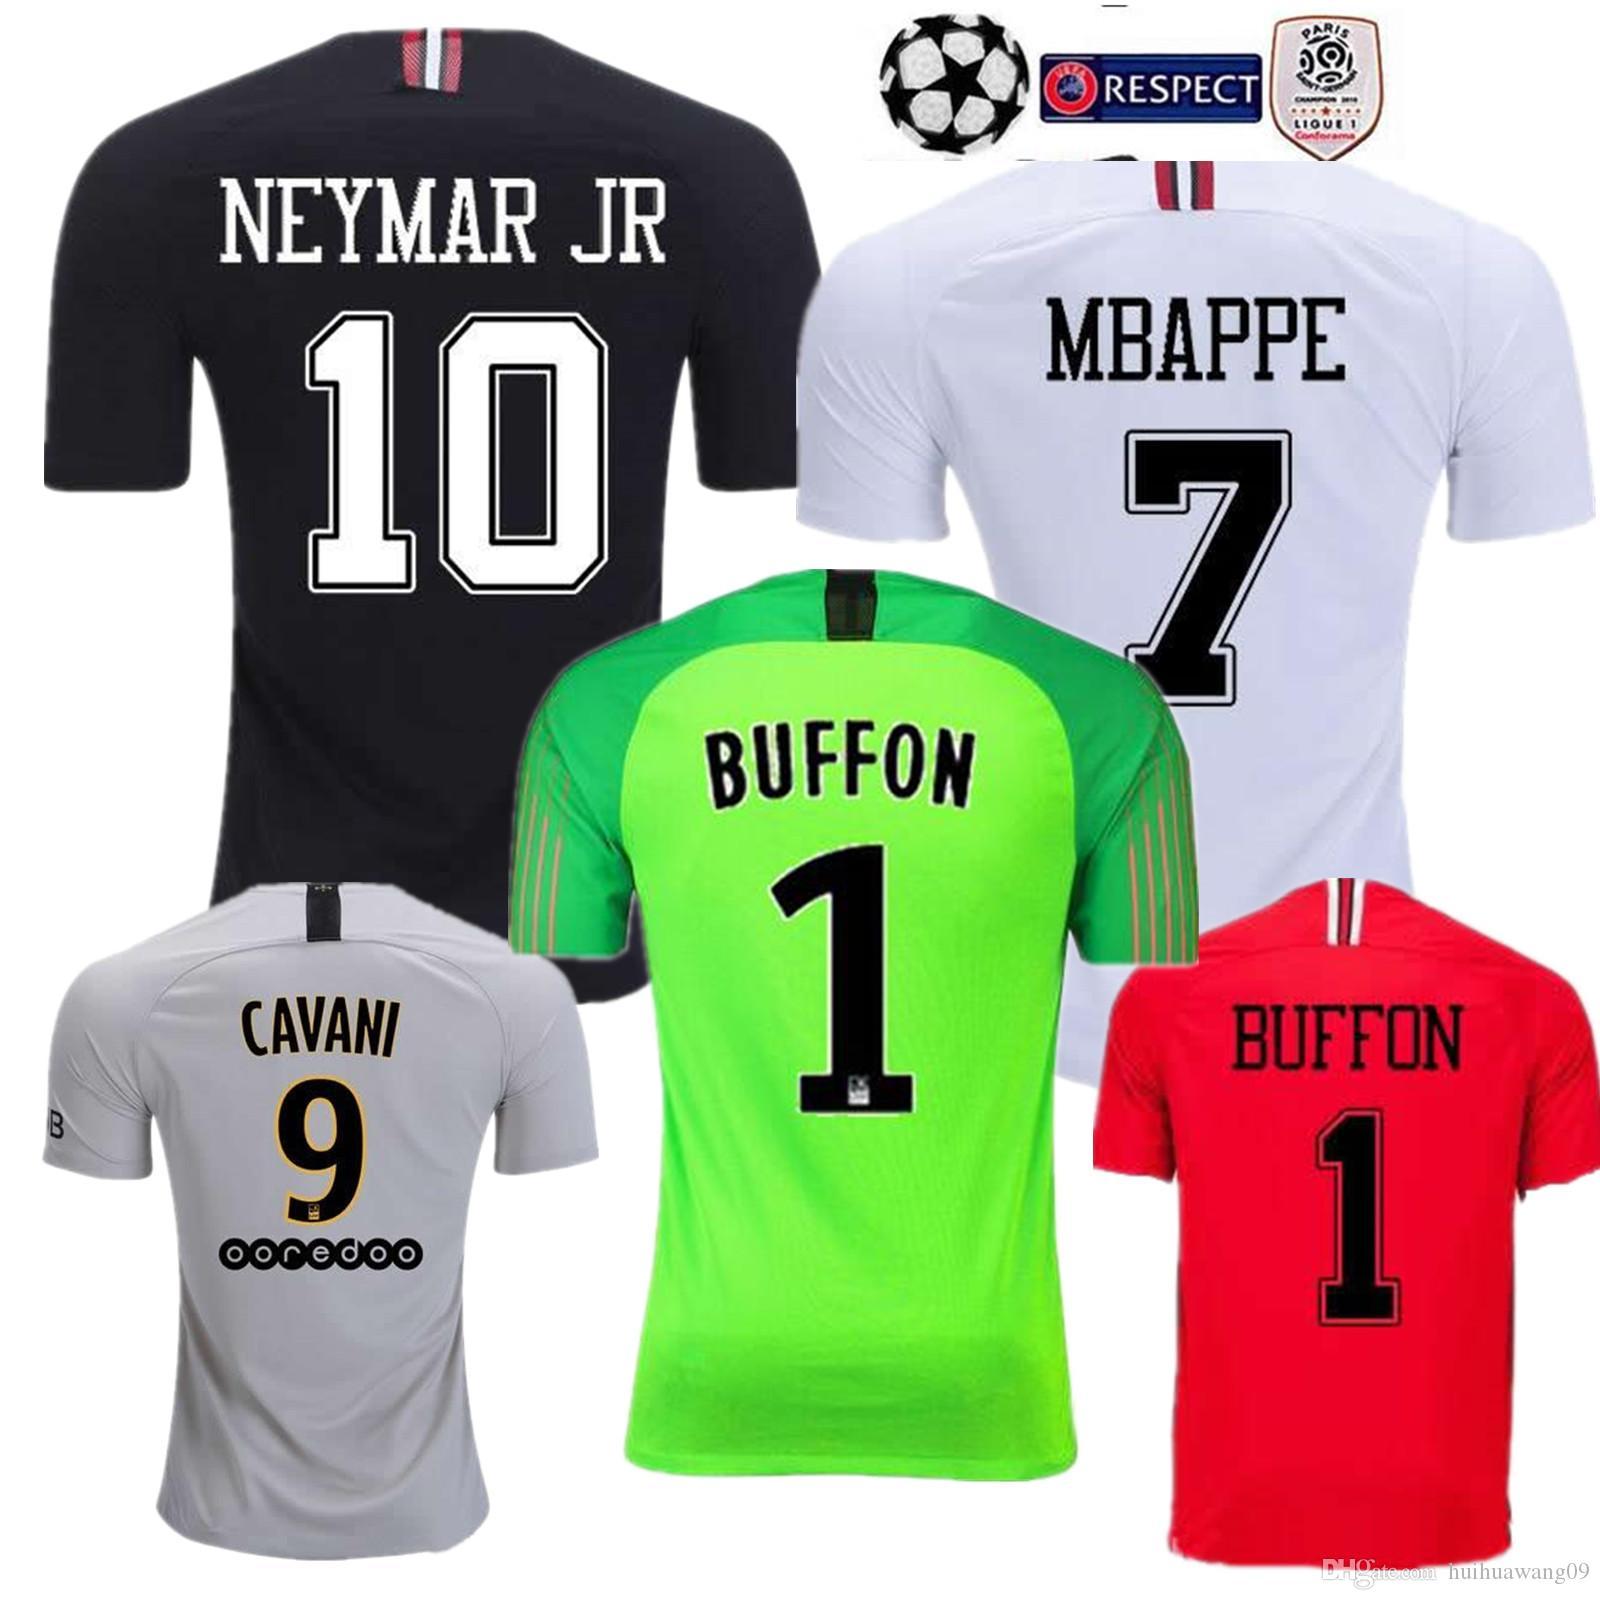 Maillots 18 19 PSG MBAPPE Camiseta Local T SILVA CAVANI DI MARIA PASTORE  2018 2019 Paris Verratti Buffon Portero Campeones Camiseta Jersey Liga Por  ... 90fde6f274b50